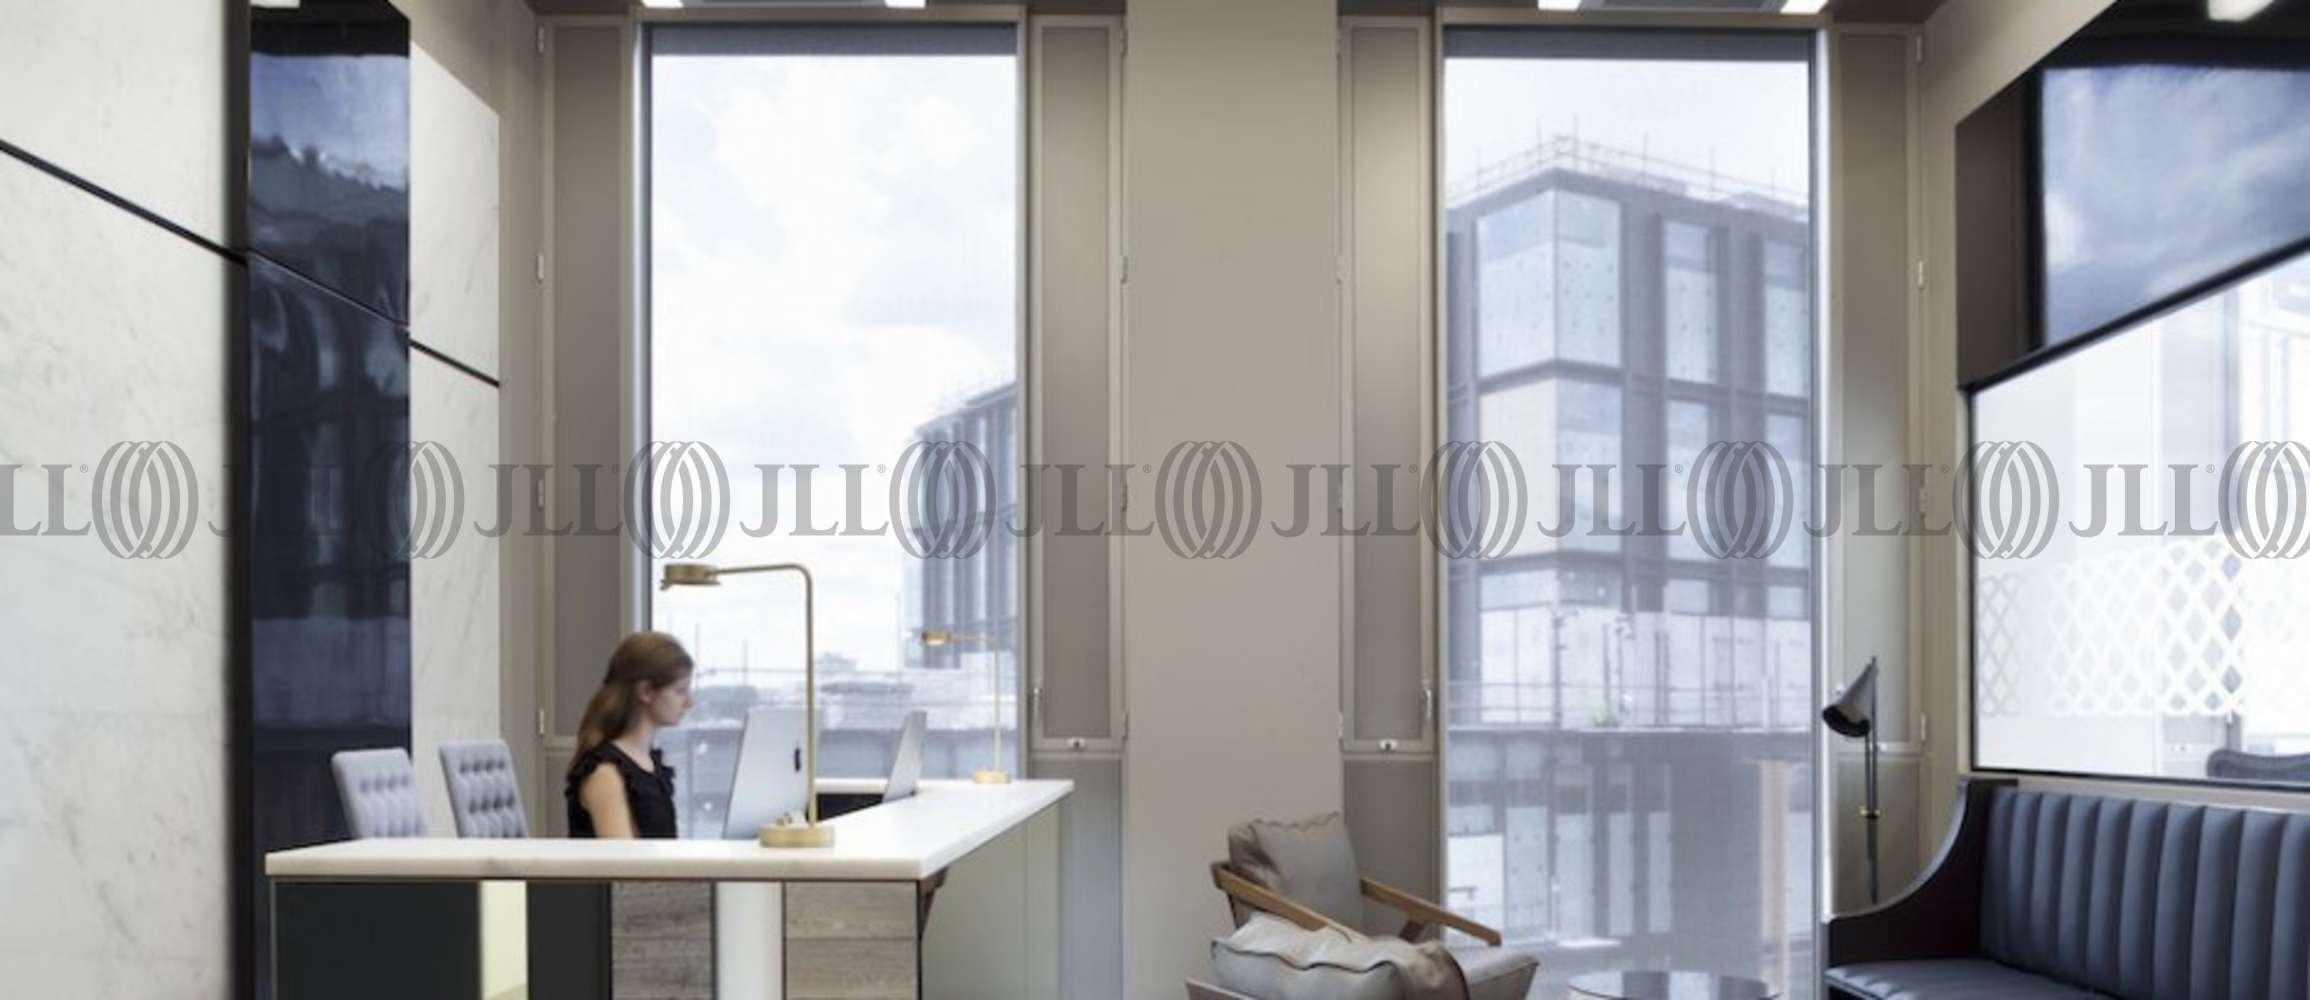 Serviced office London, N1C 4AG - Gridiron Building  - 407